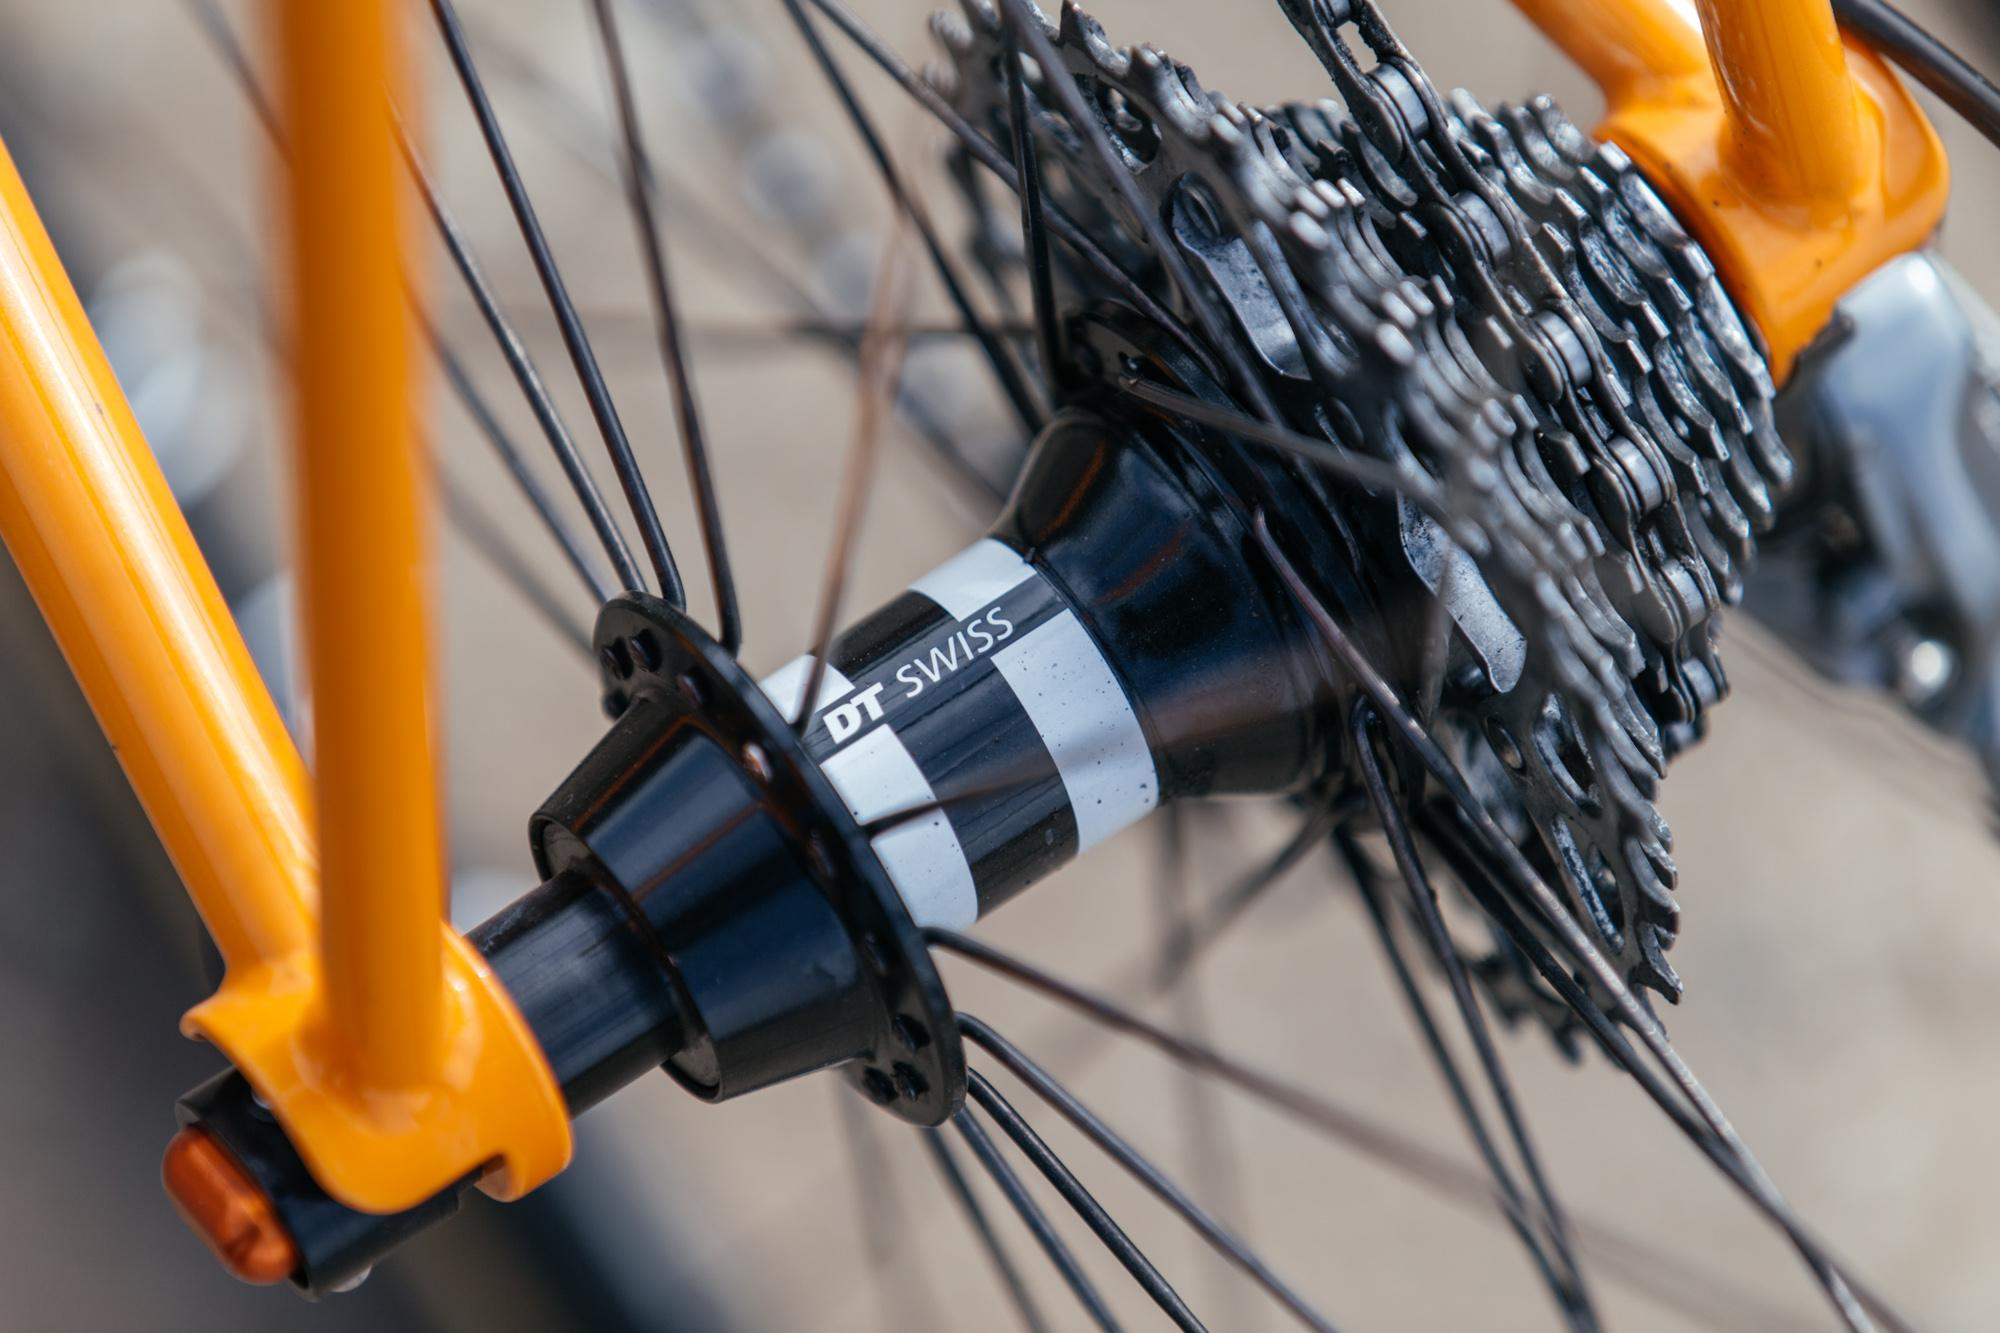 Garrett's Falconer x Hunter Cycles Chubby Road Bike